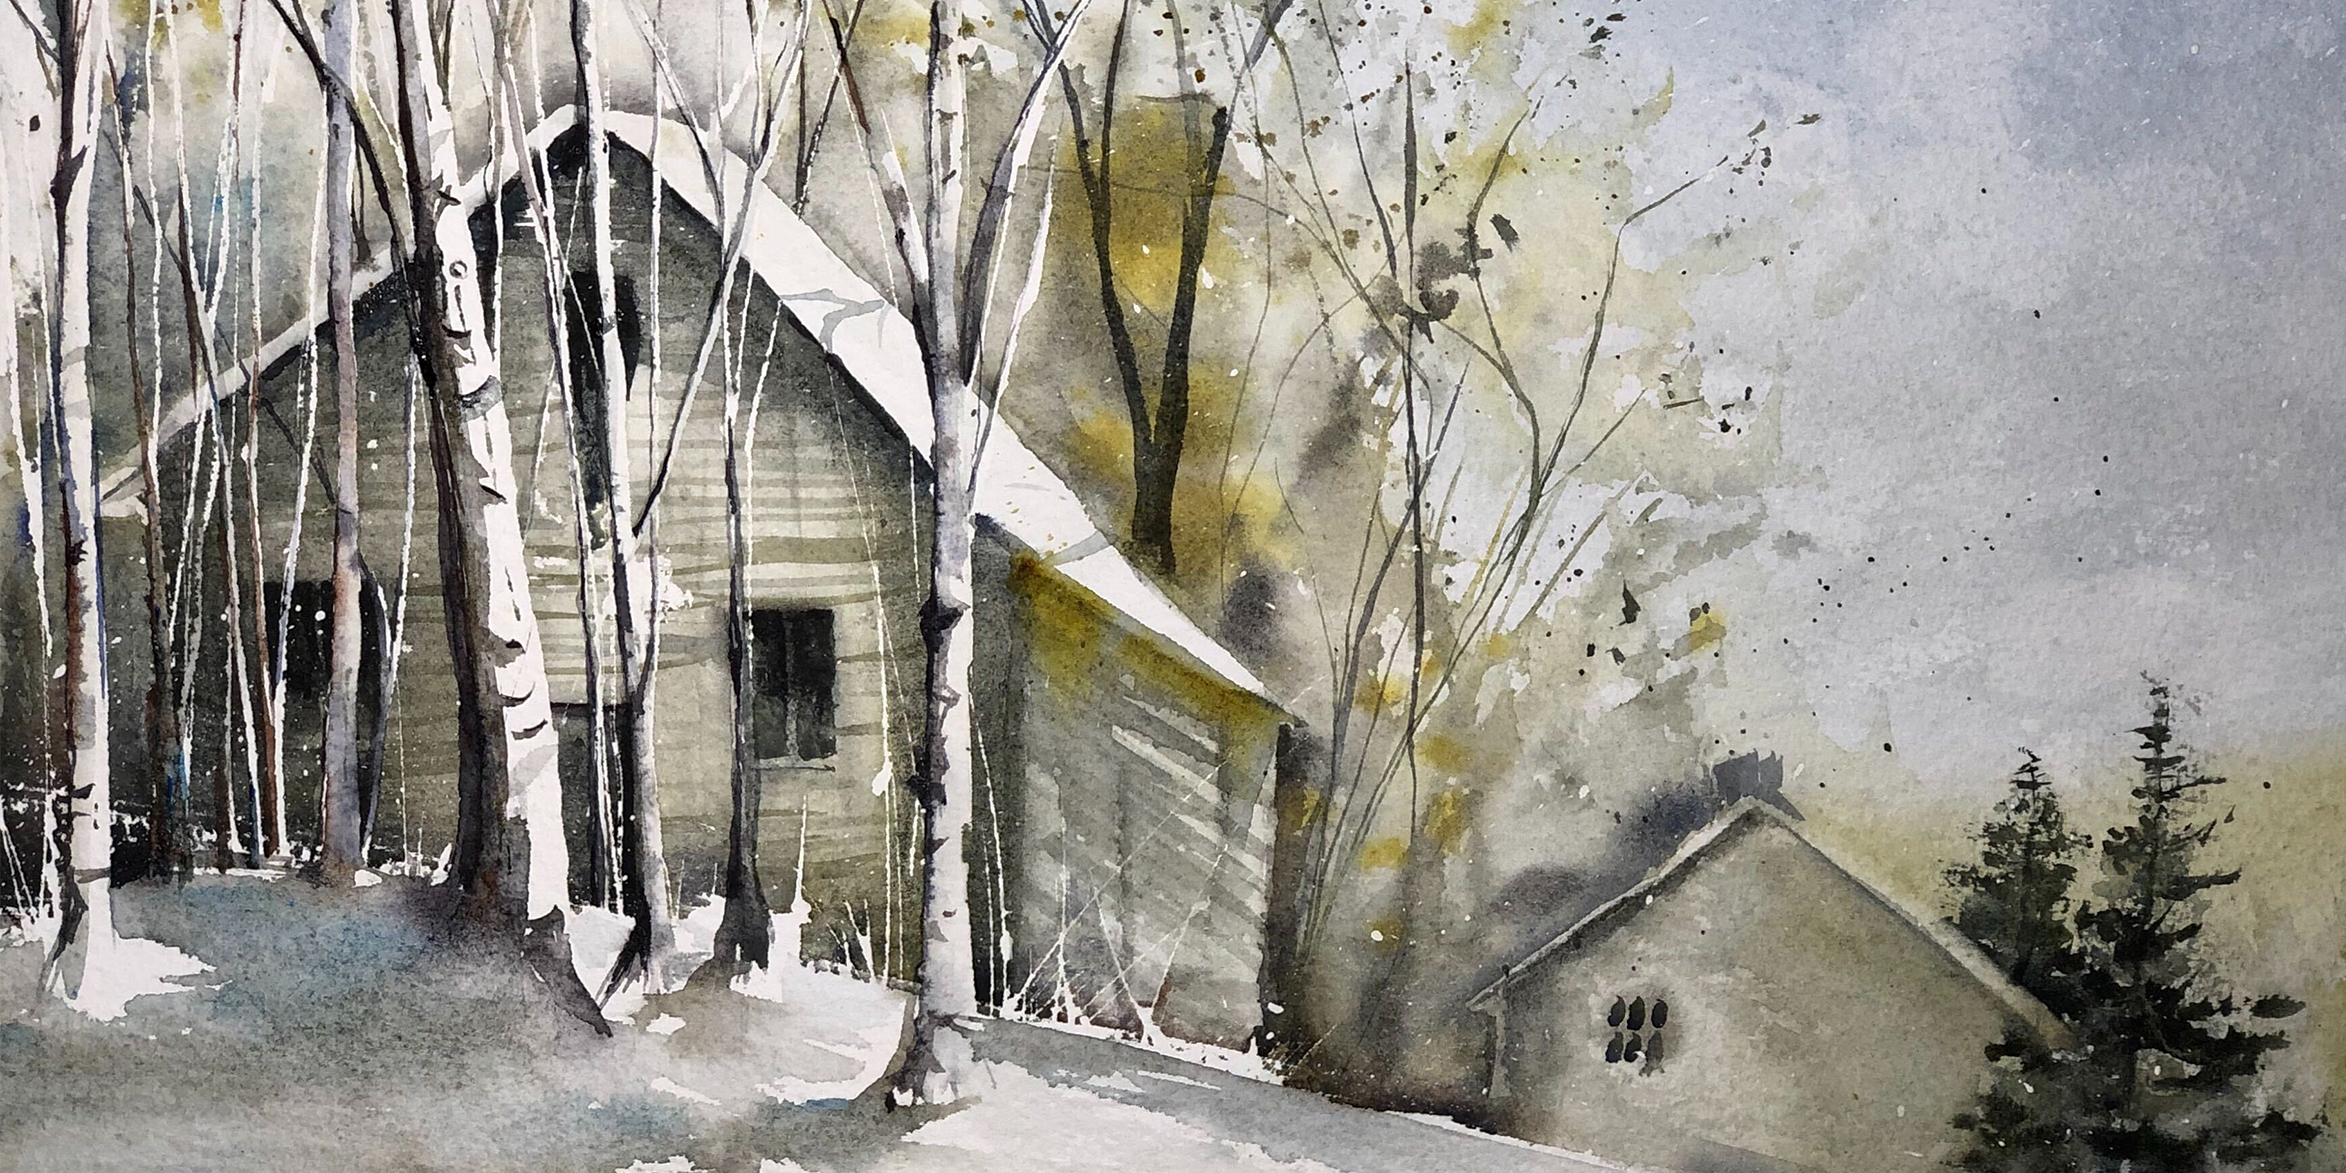 Ray Hendershot Exercise: Birch Trees